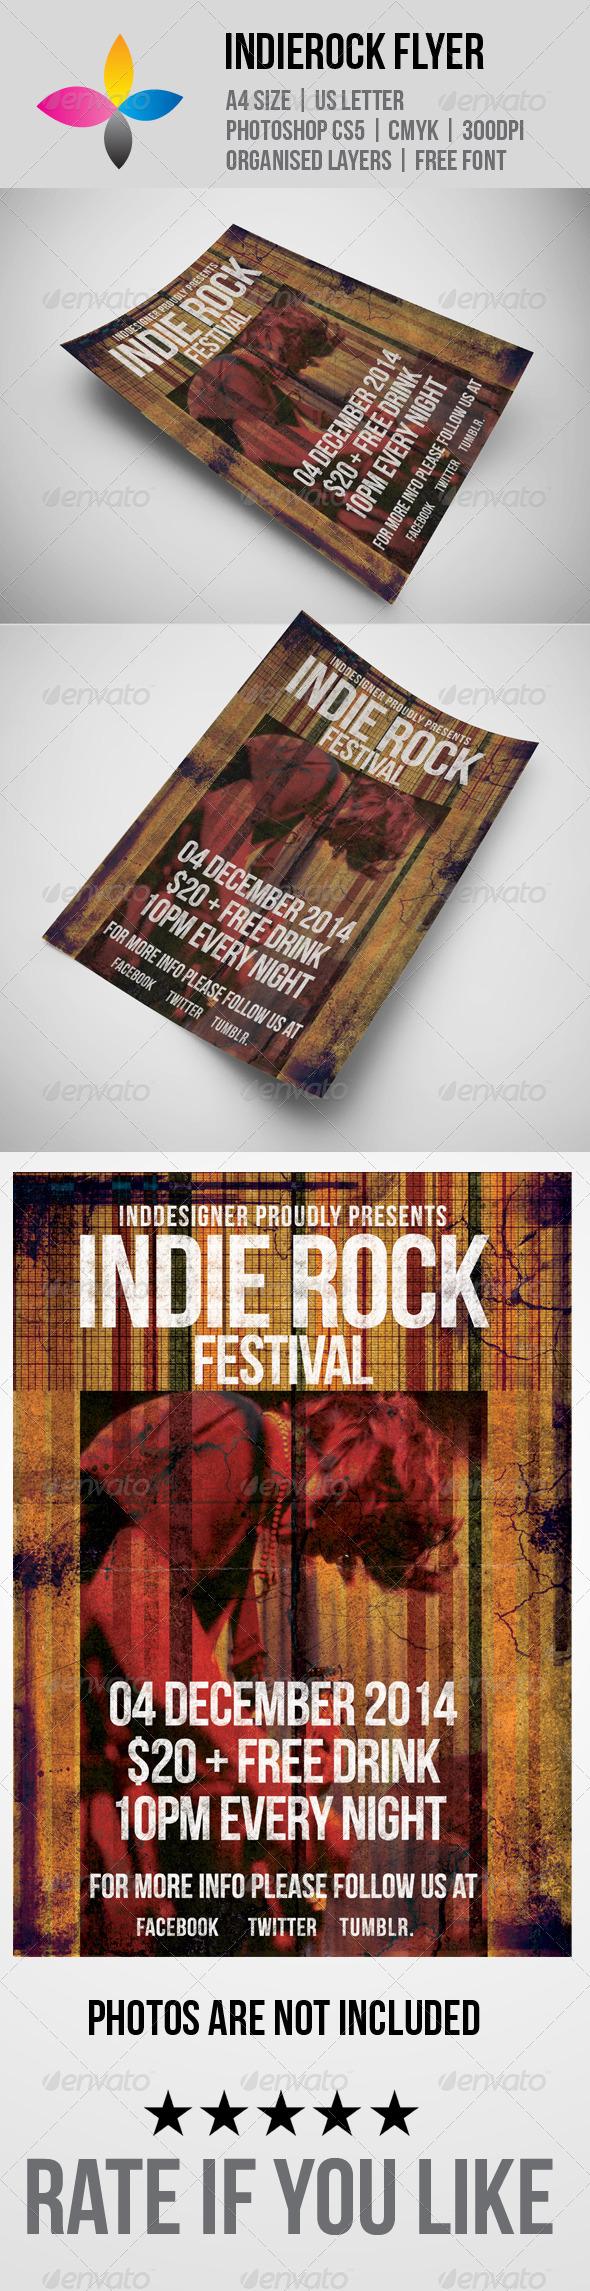 GraphicRiver Indie Rock Flyer 5934099